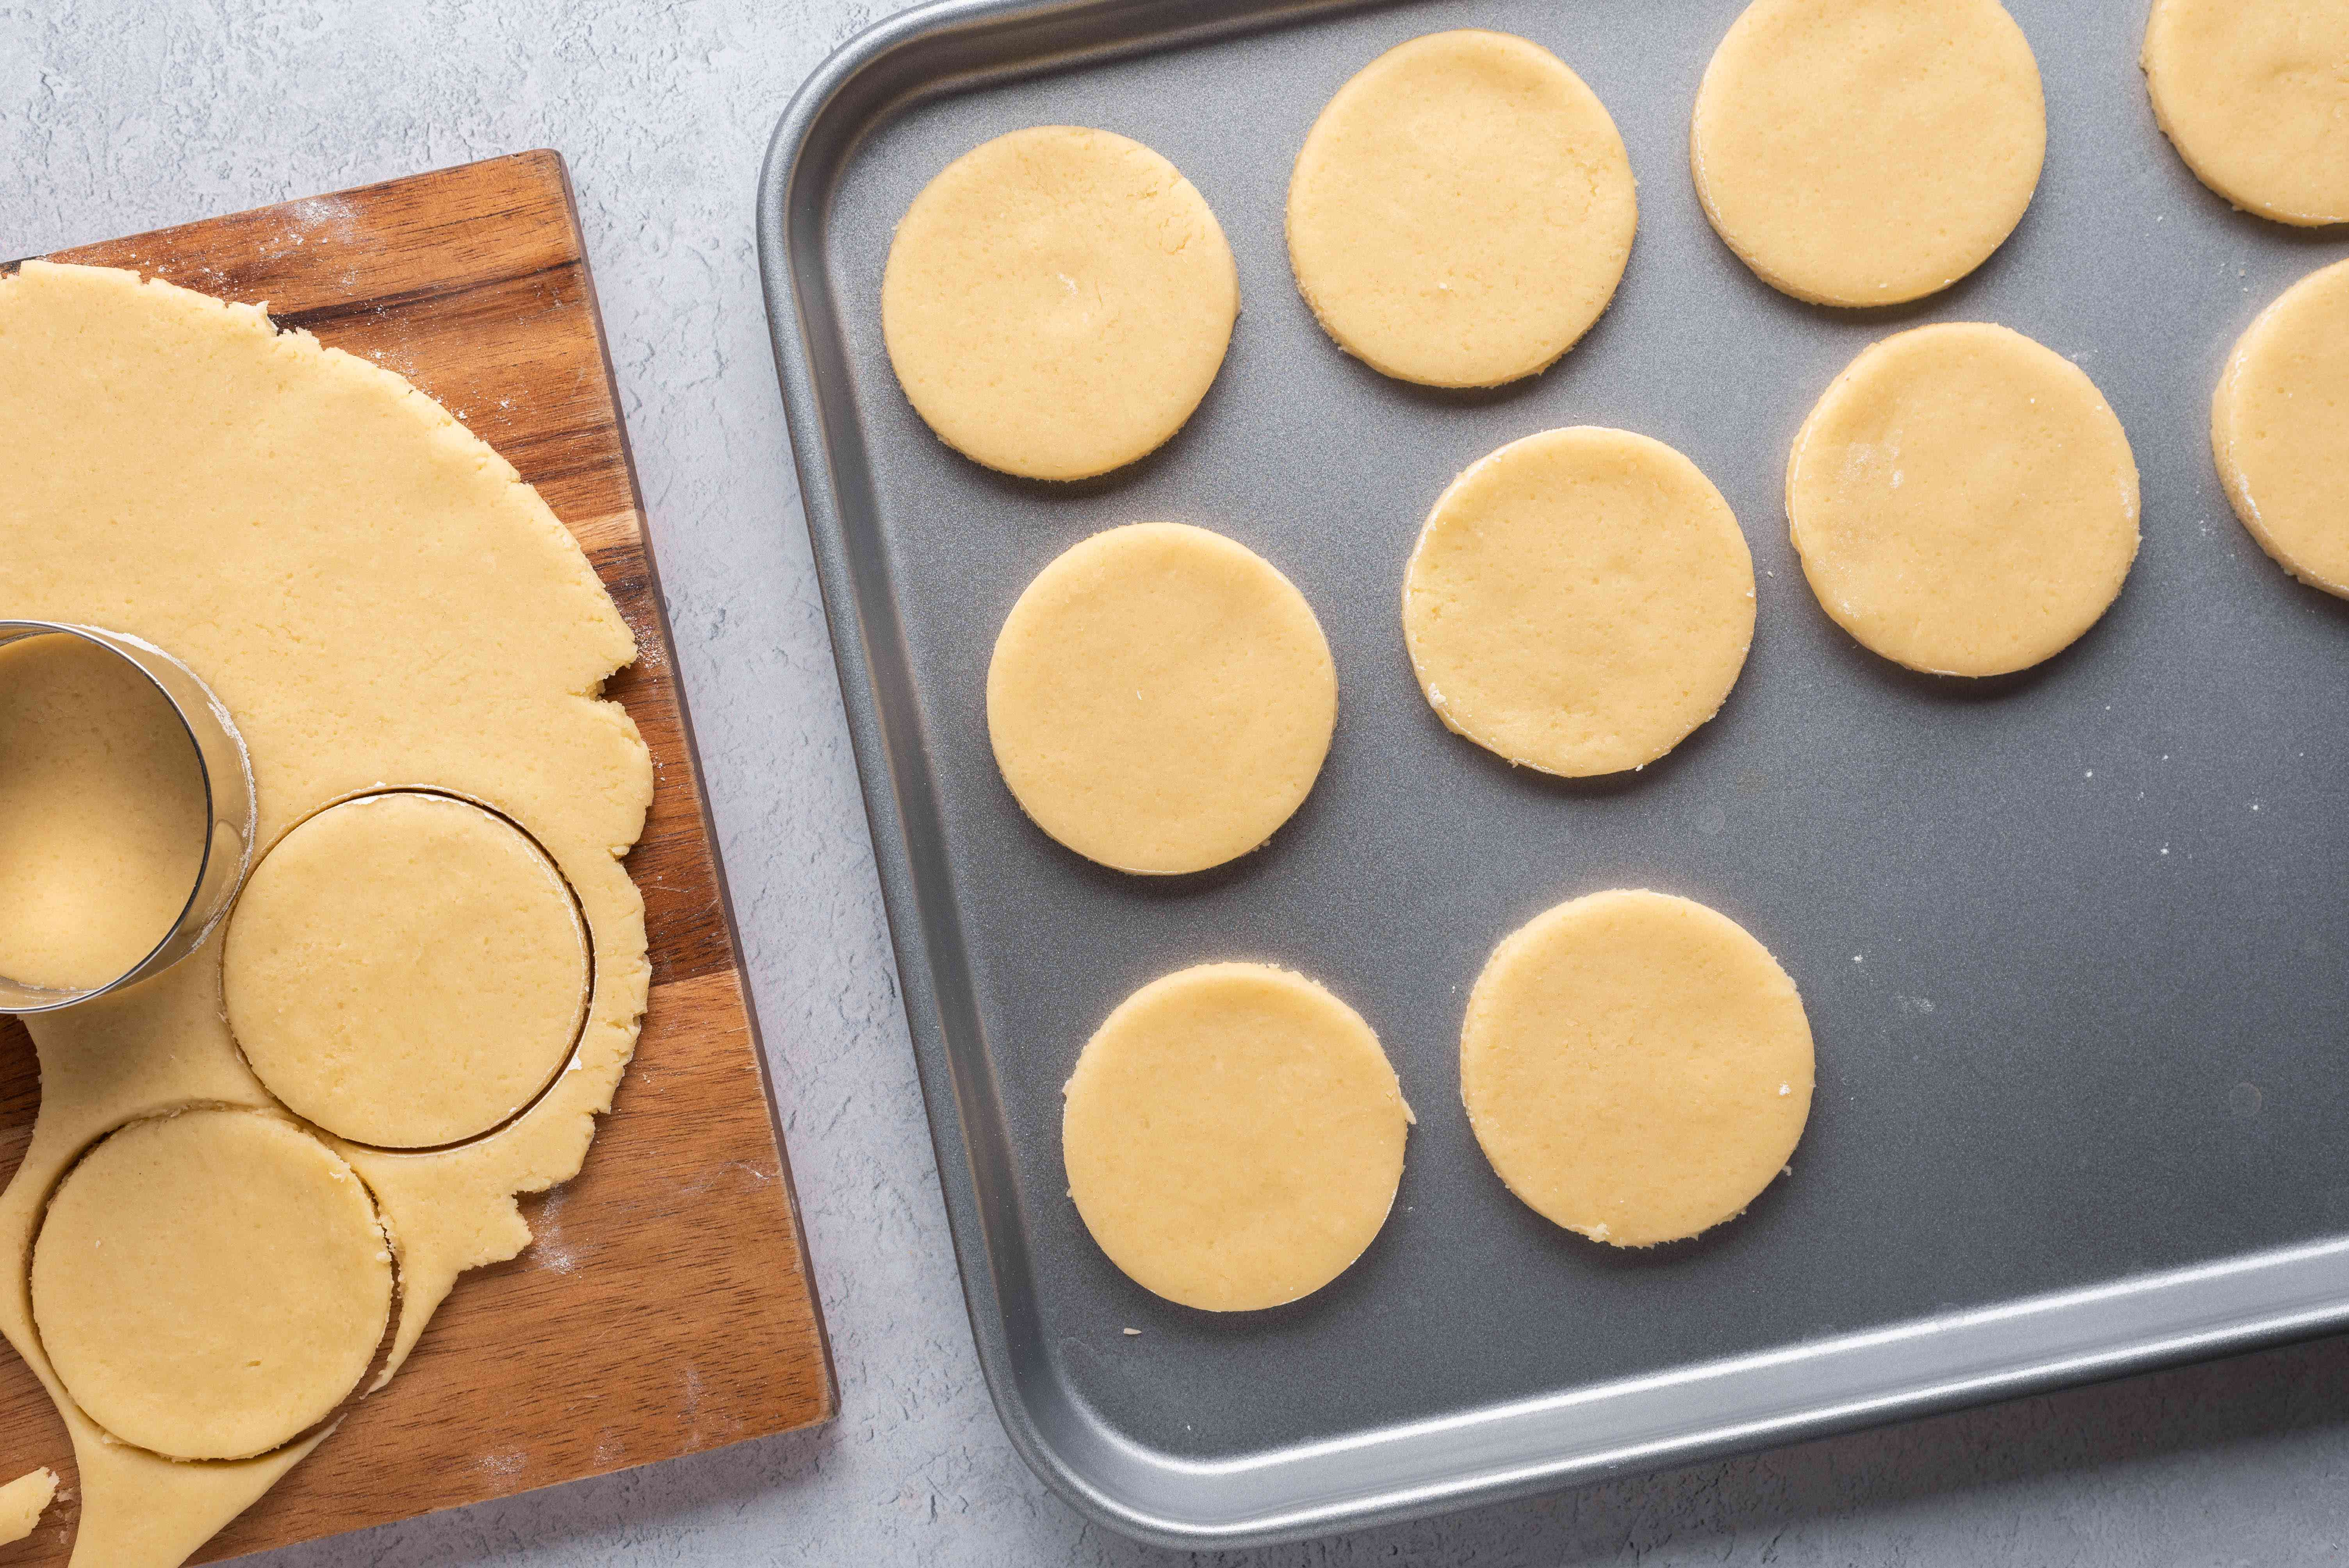 Cut cookies on a baking sheet